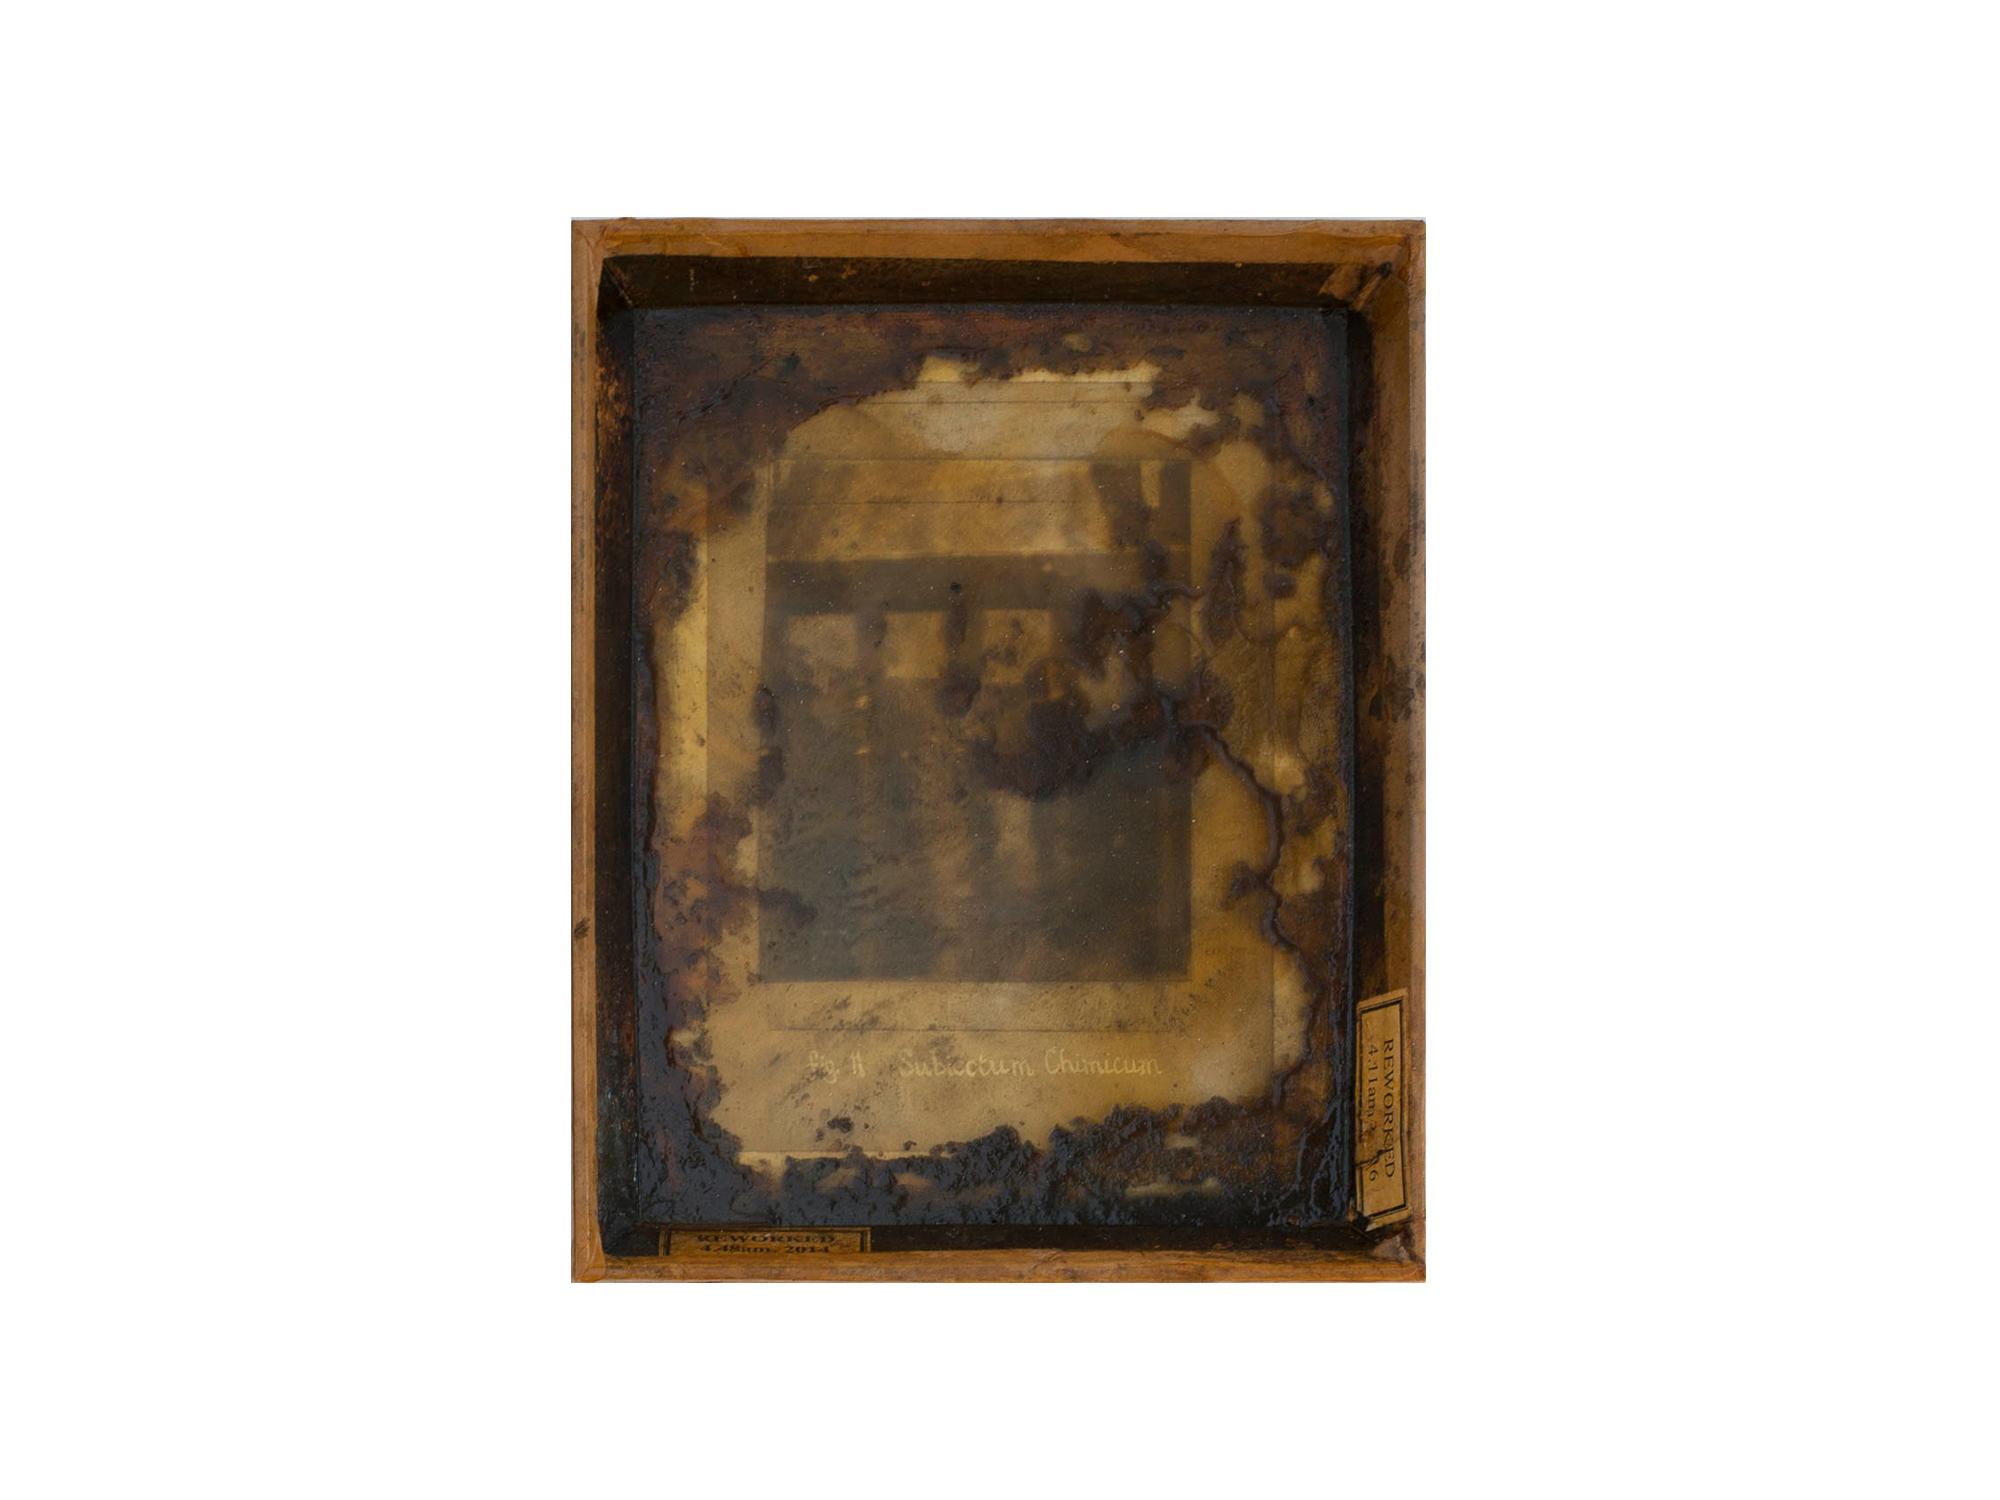 Bernard Sachs   Subiectum Chimicum , 2016 mixed media on photo on framed card 25.5 x 21cm   ARTIST BIO